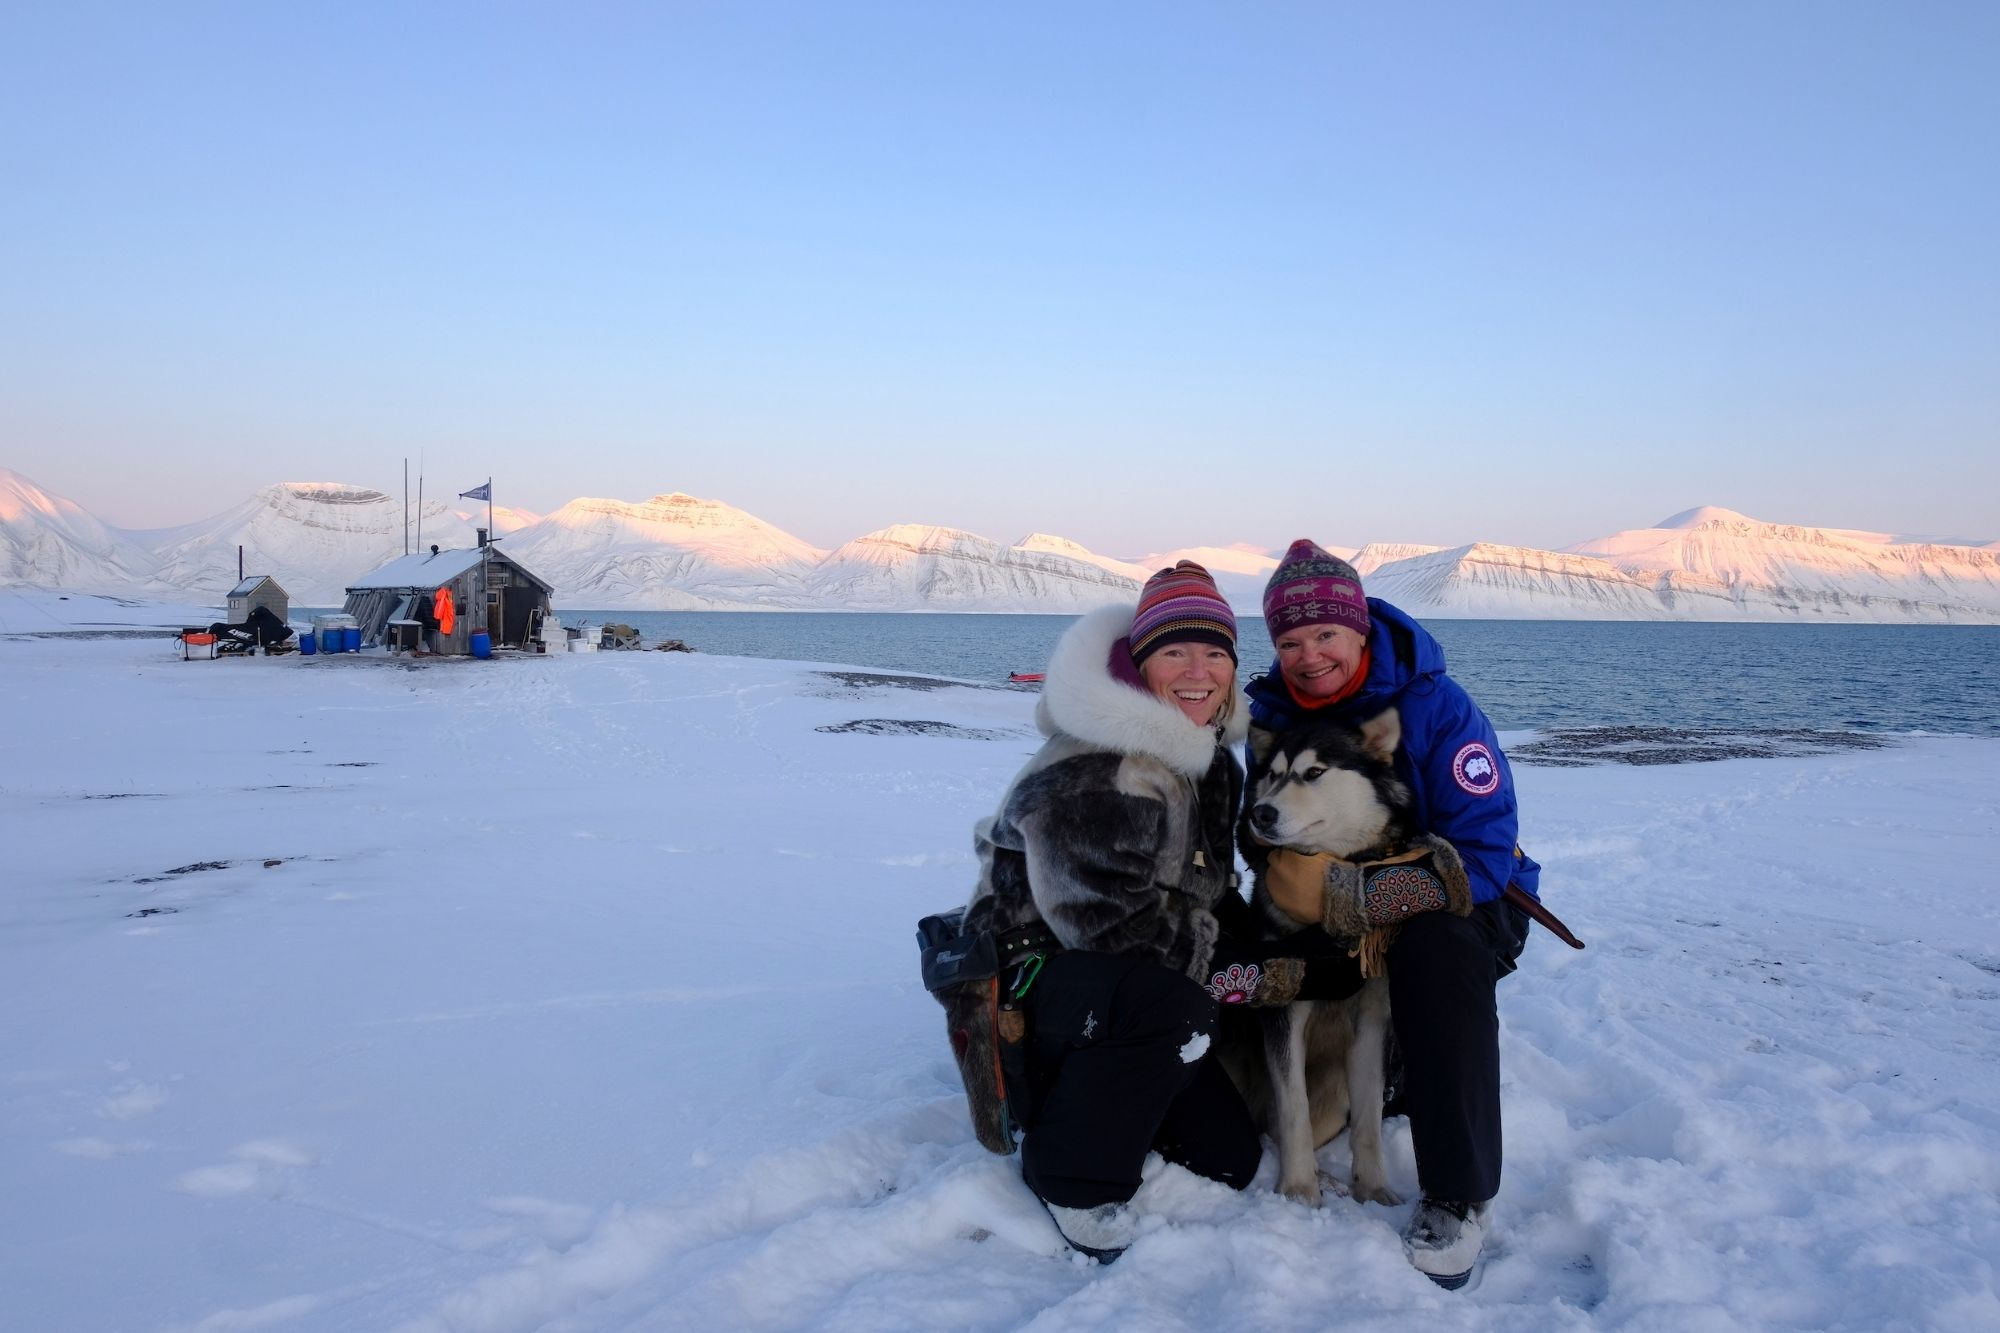 Sunniva Sørby & Hilde Fålun Strøm taufen MS Fridtjof Nansen